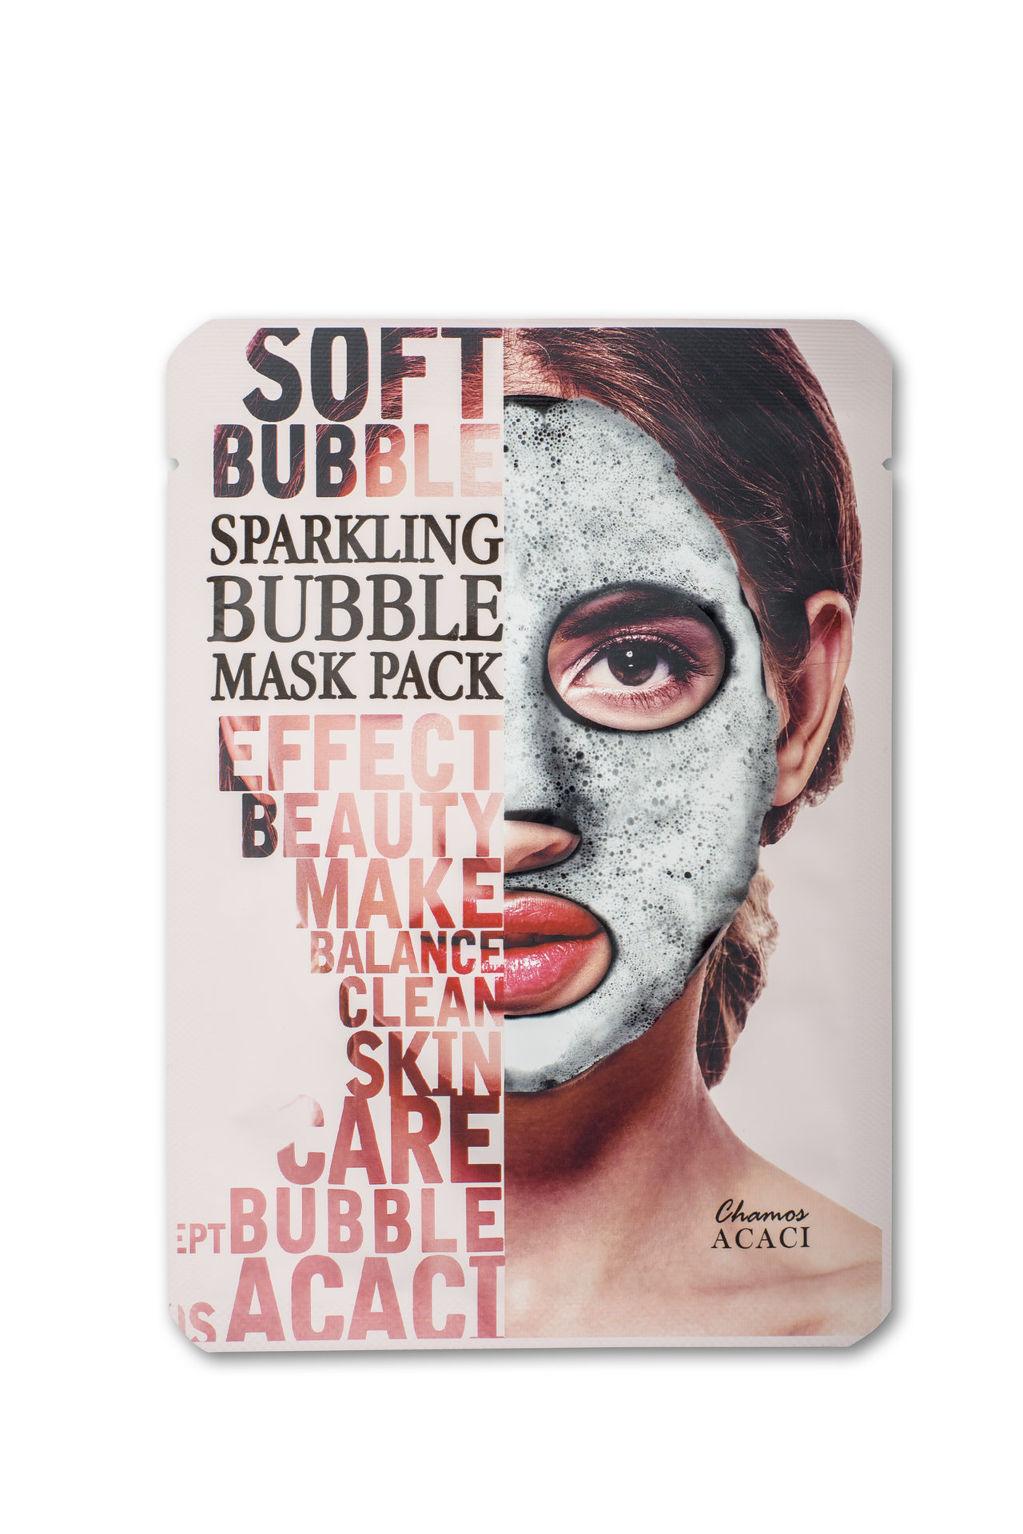 Chamos ACACI Sparkling Bubble Mask Pack - b5c08-buuble.jpg